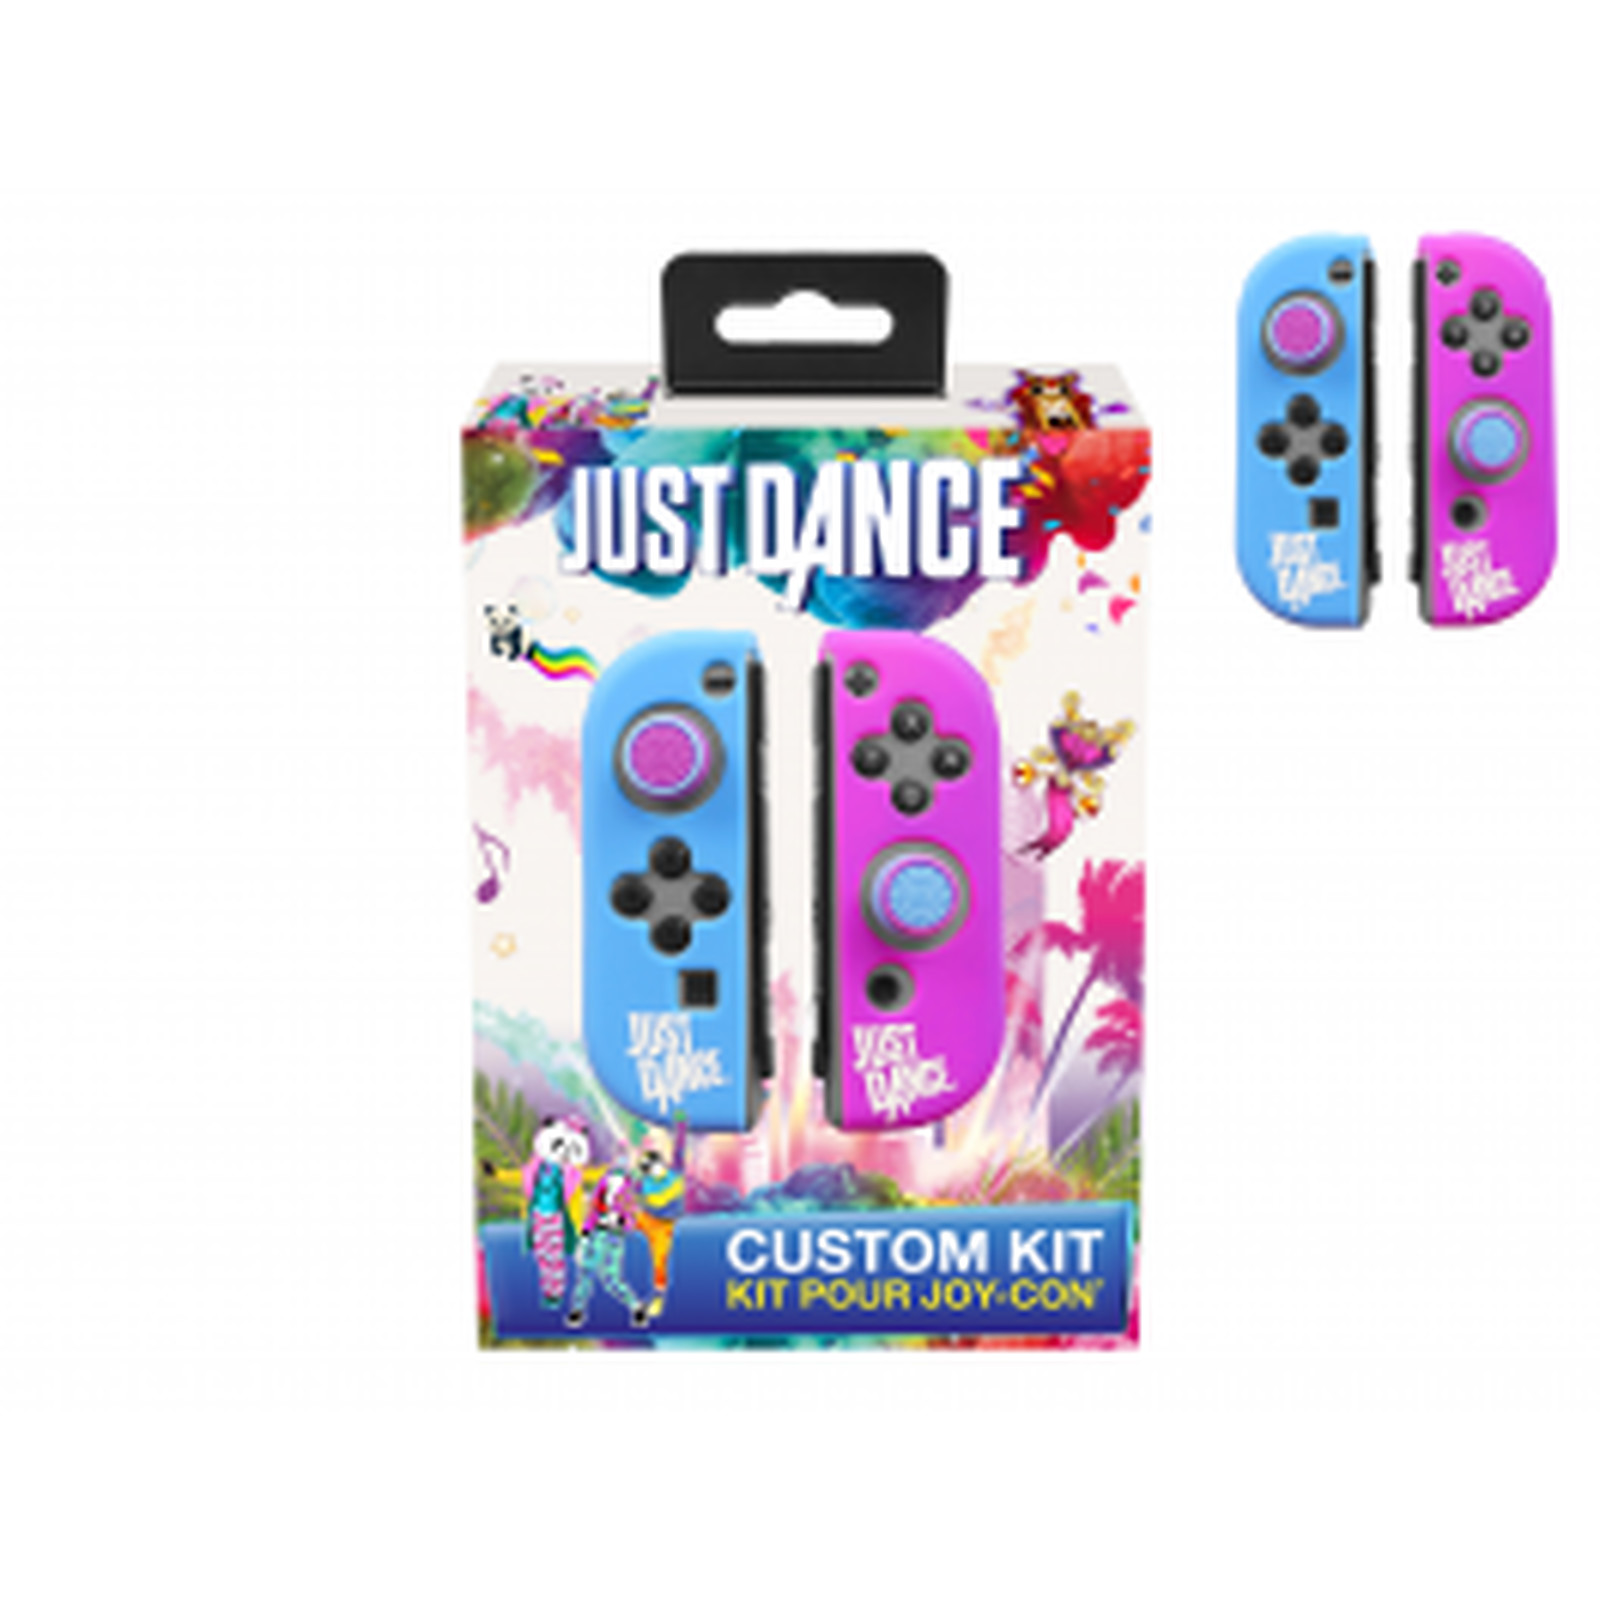 Just Dance Kit de customisation officiel